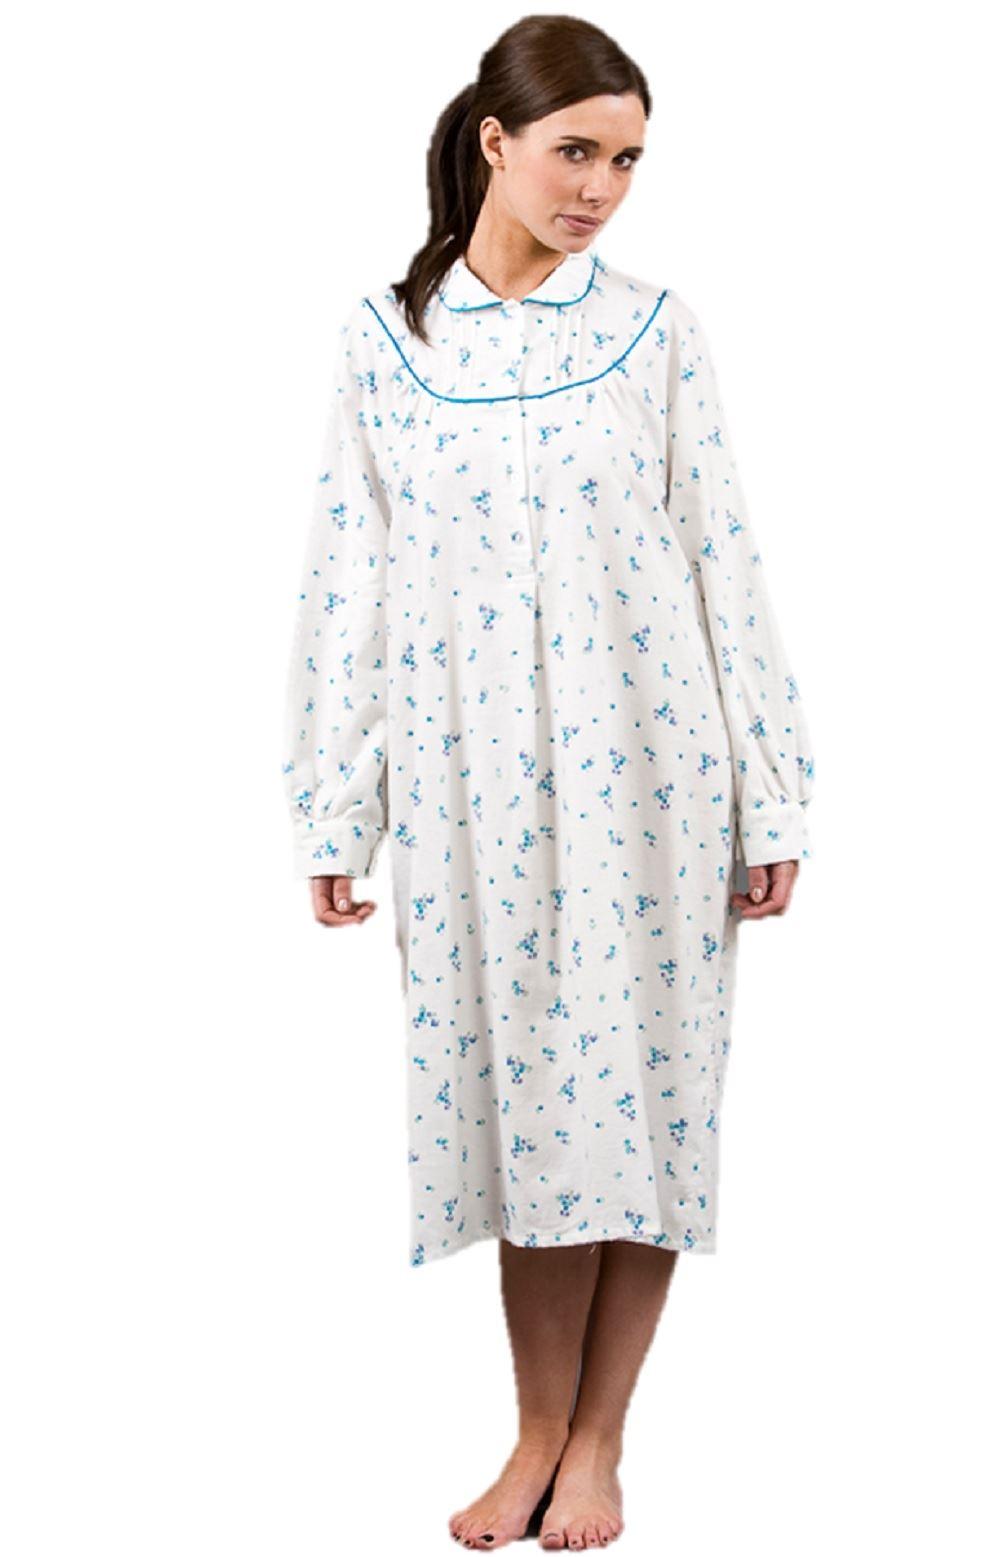 Mujer-Winceyette-100-Algodon-Peinado-Floreado-Camison-Camison-Pijama